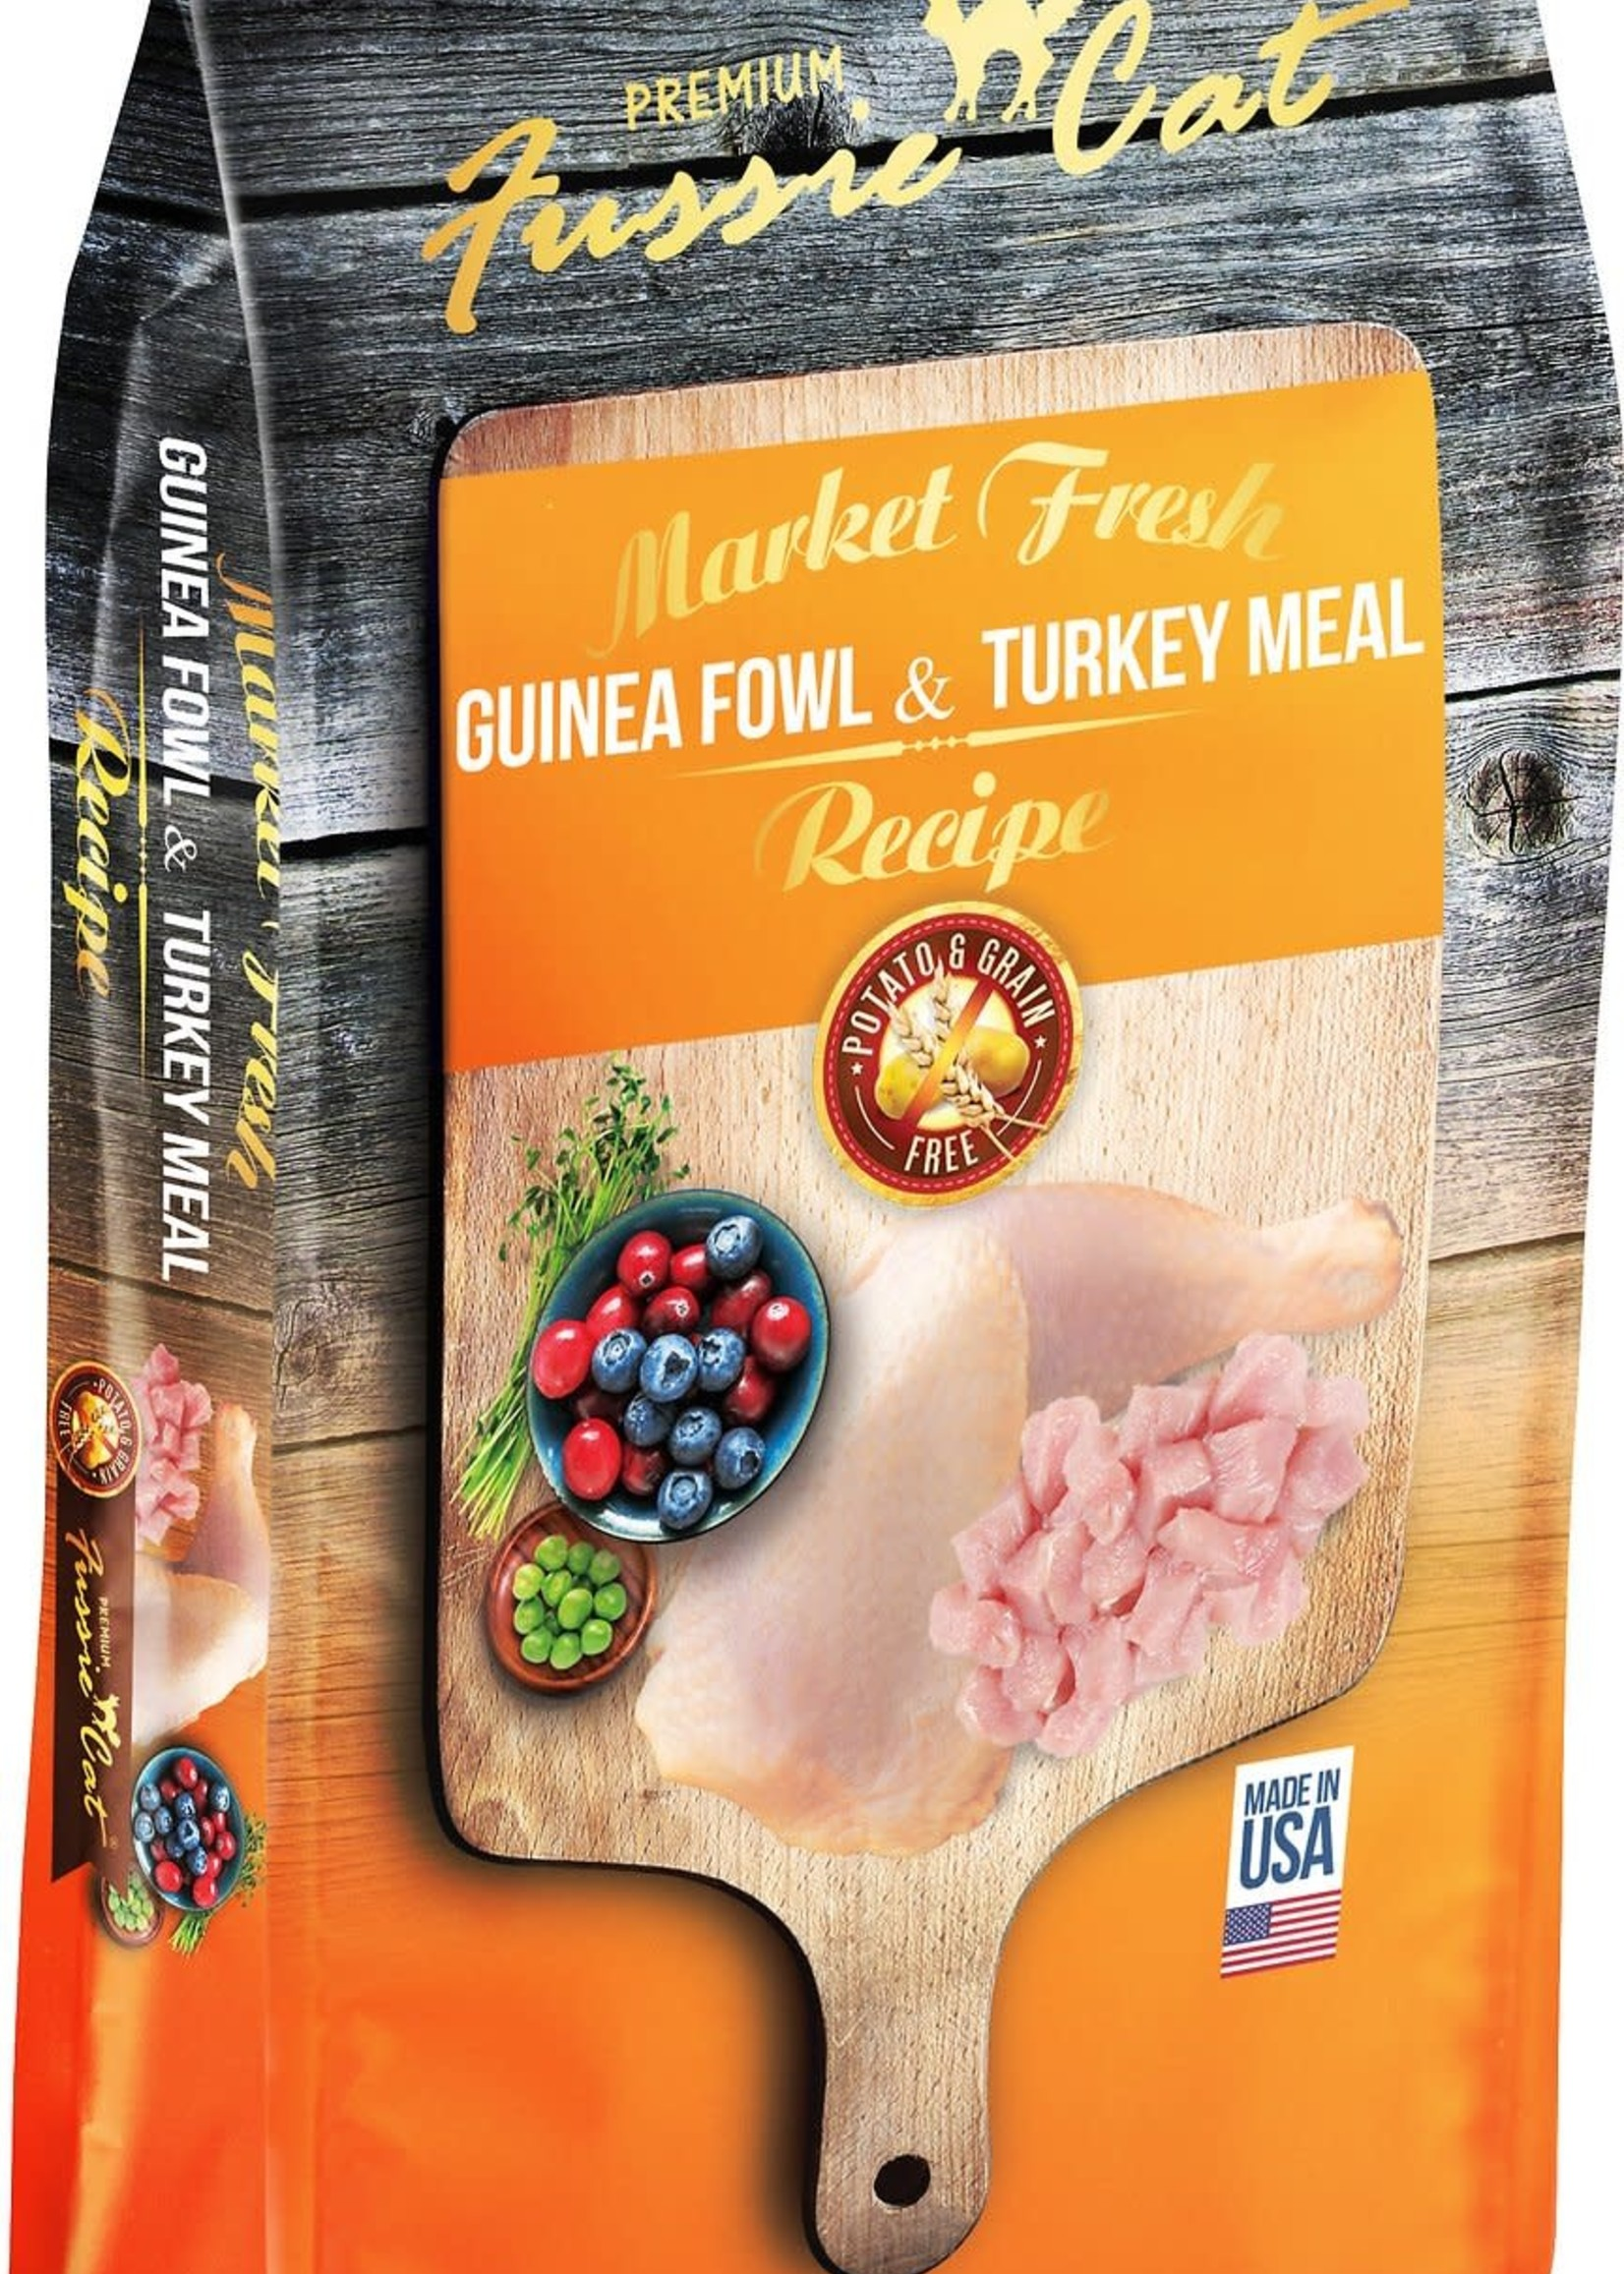 Fussie Cat Fussie Cat Dry Market Fresh Guinea Fowl and Turkey